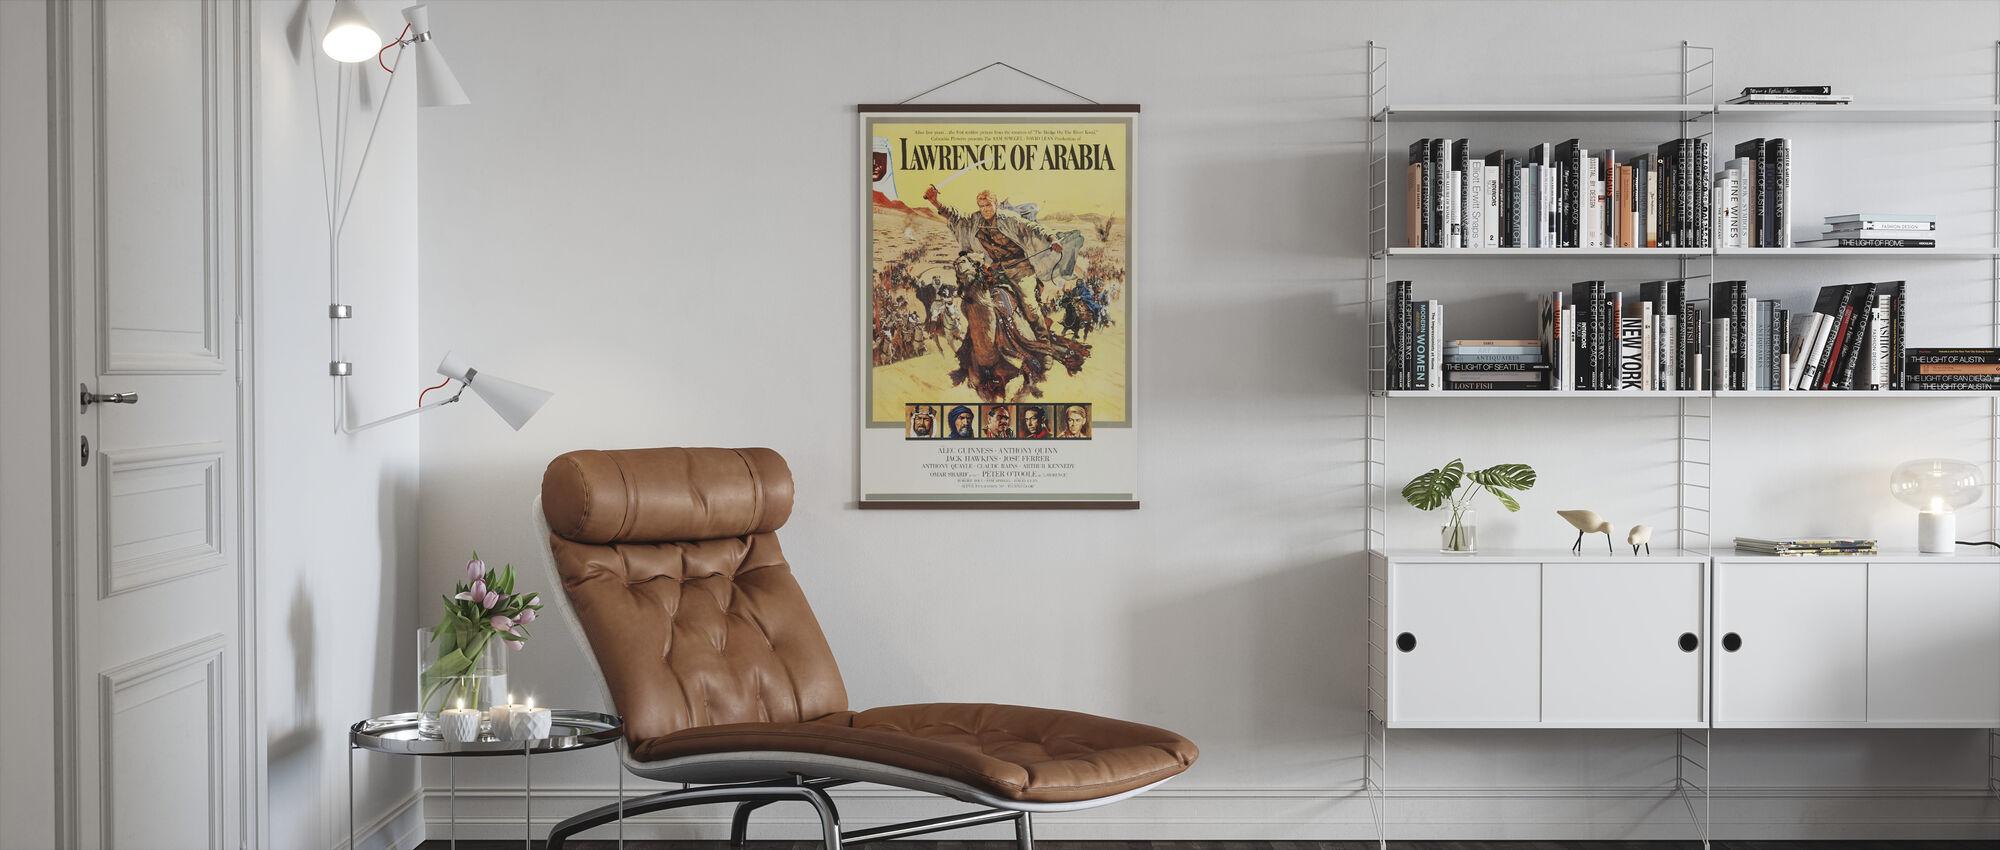 Poster Art Lawrence of Arabia - Poster - Living Room